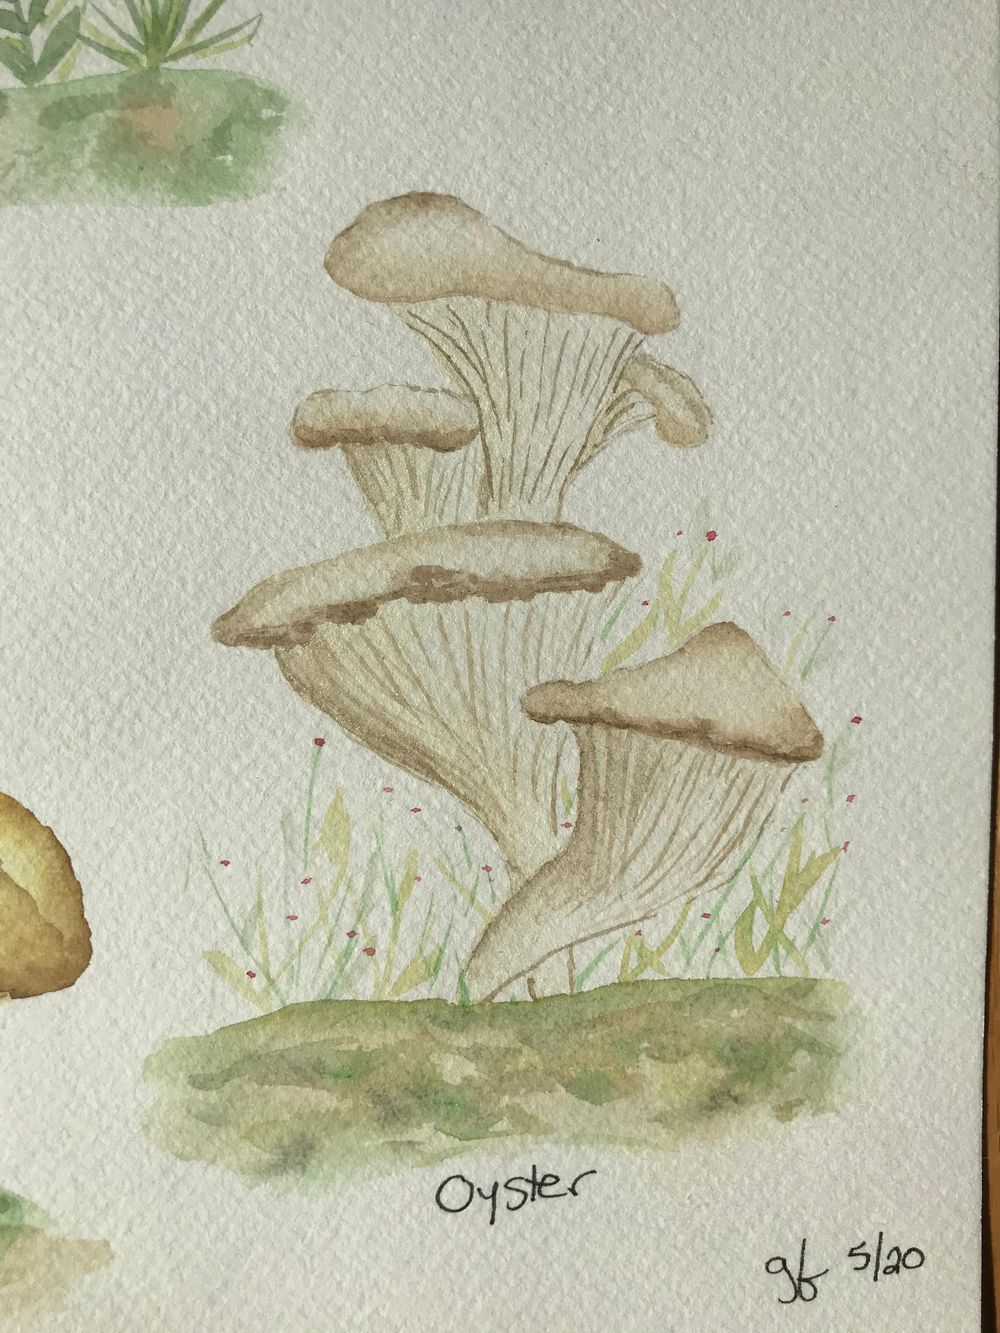 Mushrooms - image 8 - student project